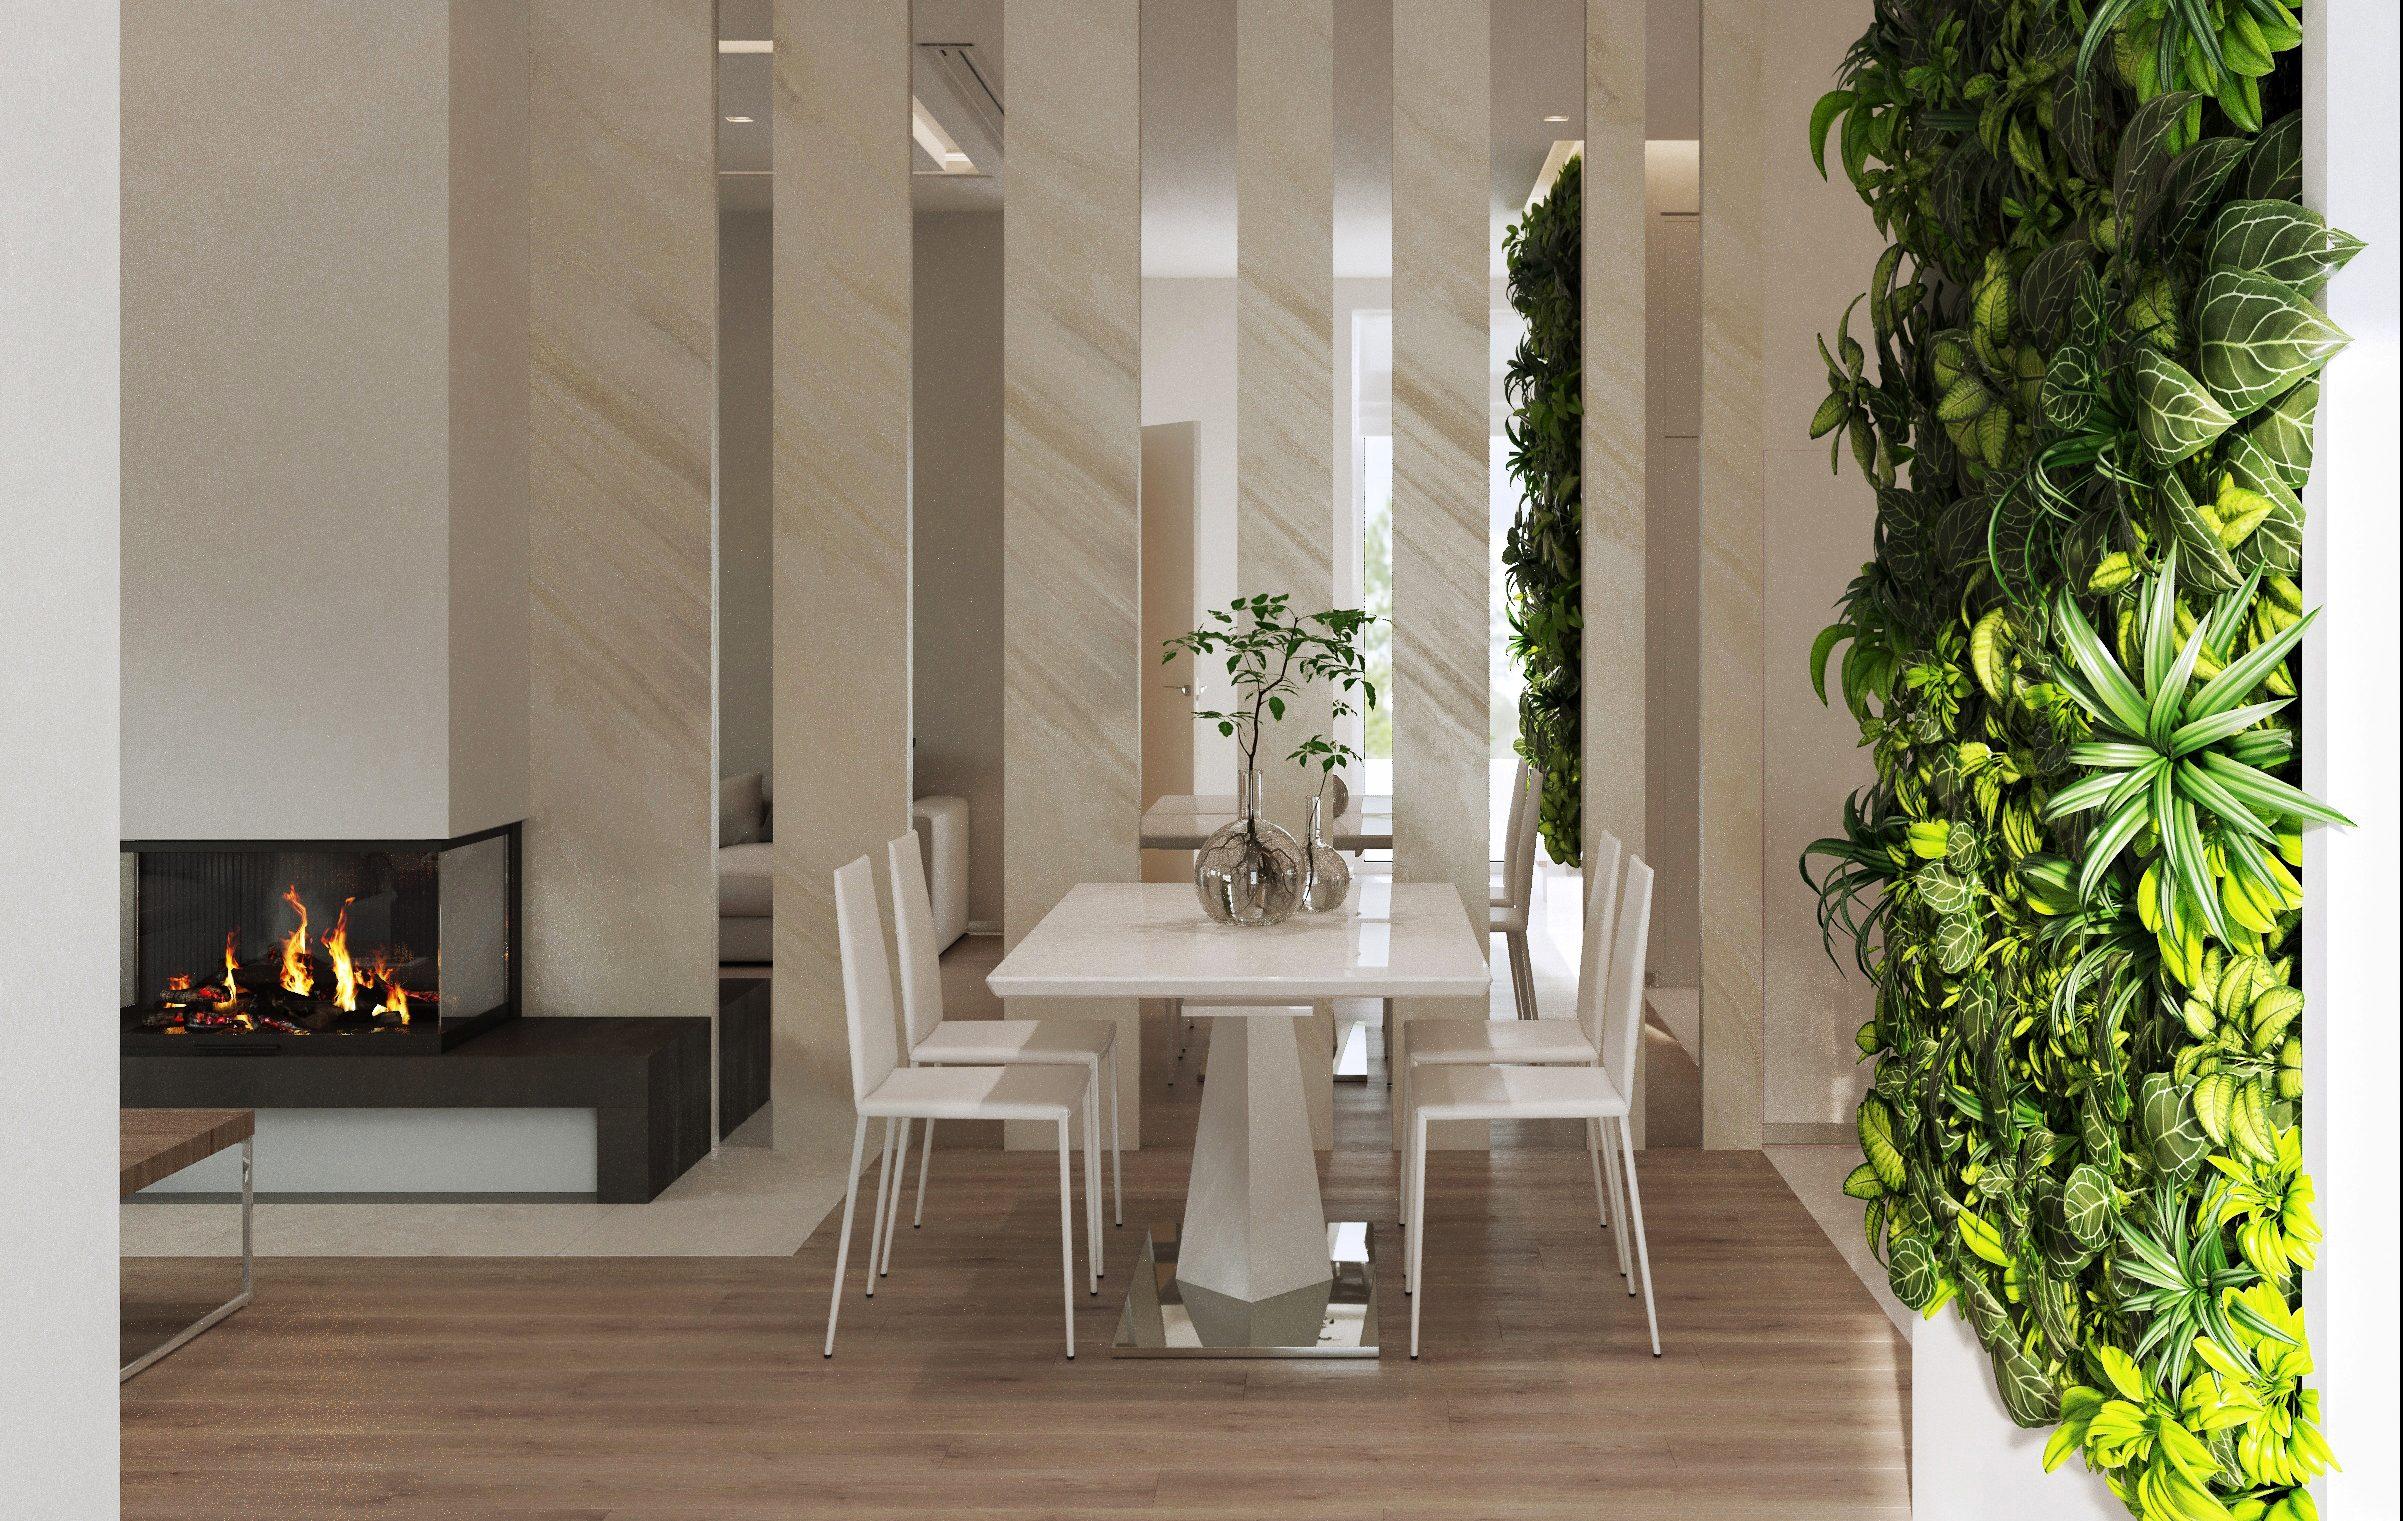 Дизайн интерьера таунхауса. Заповедный парк